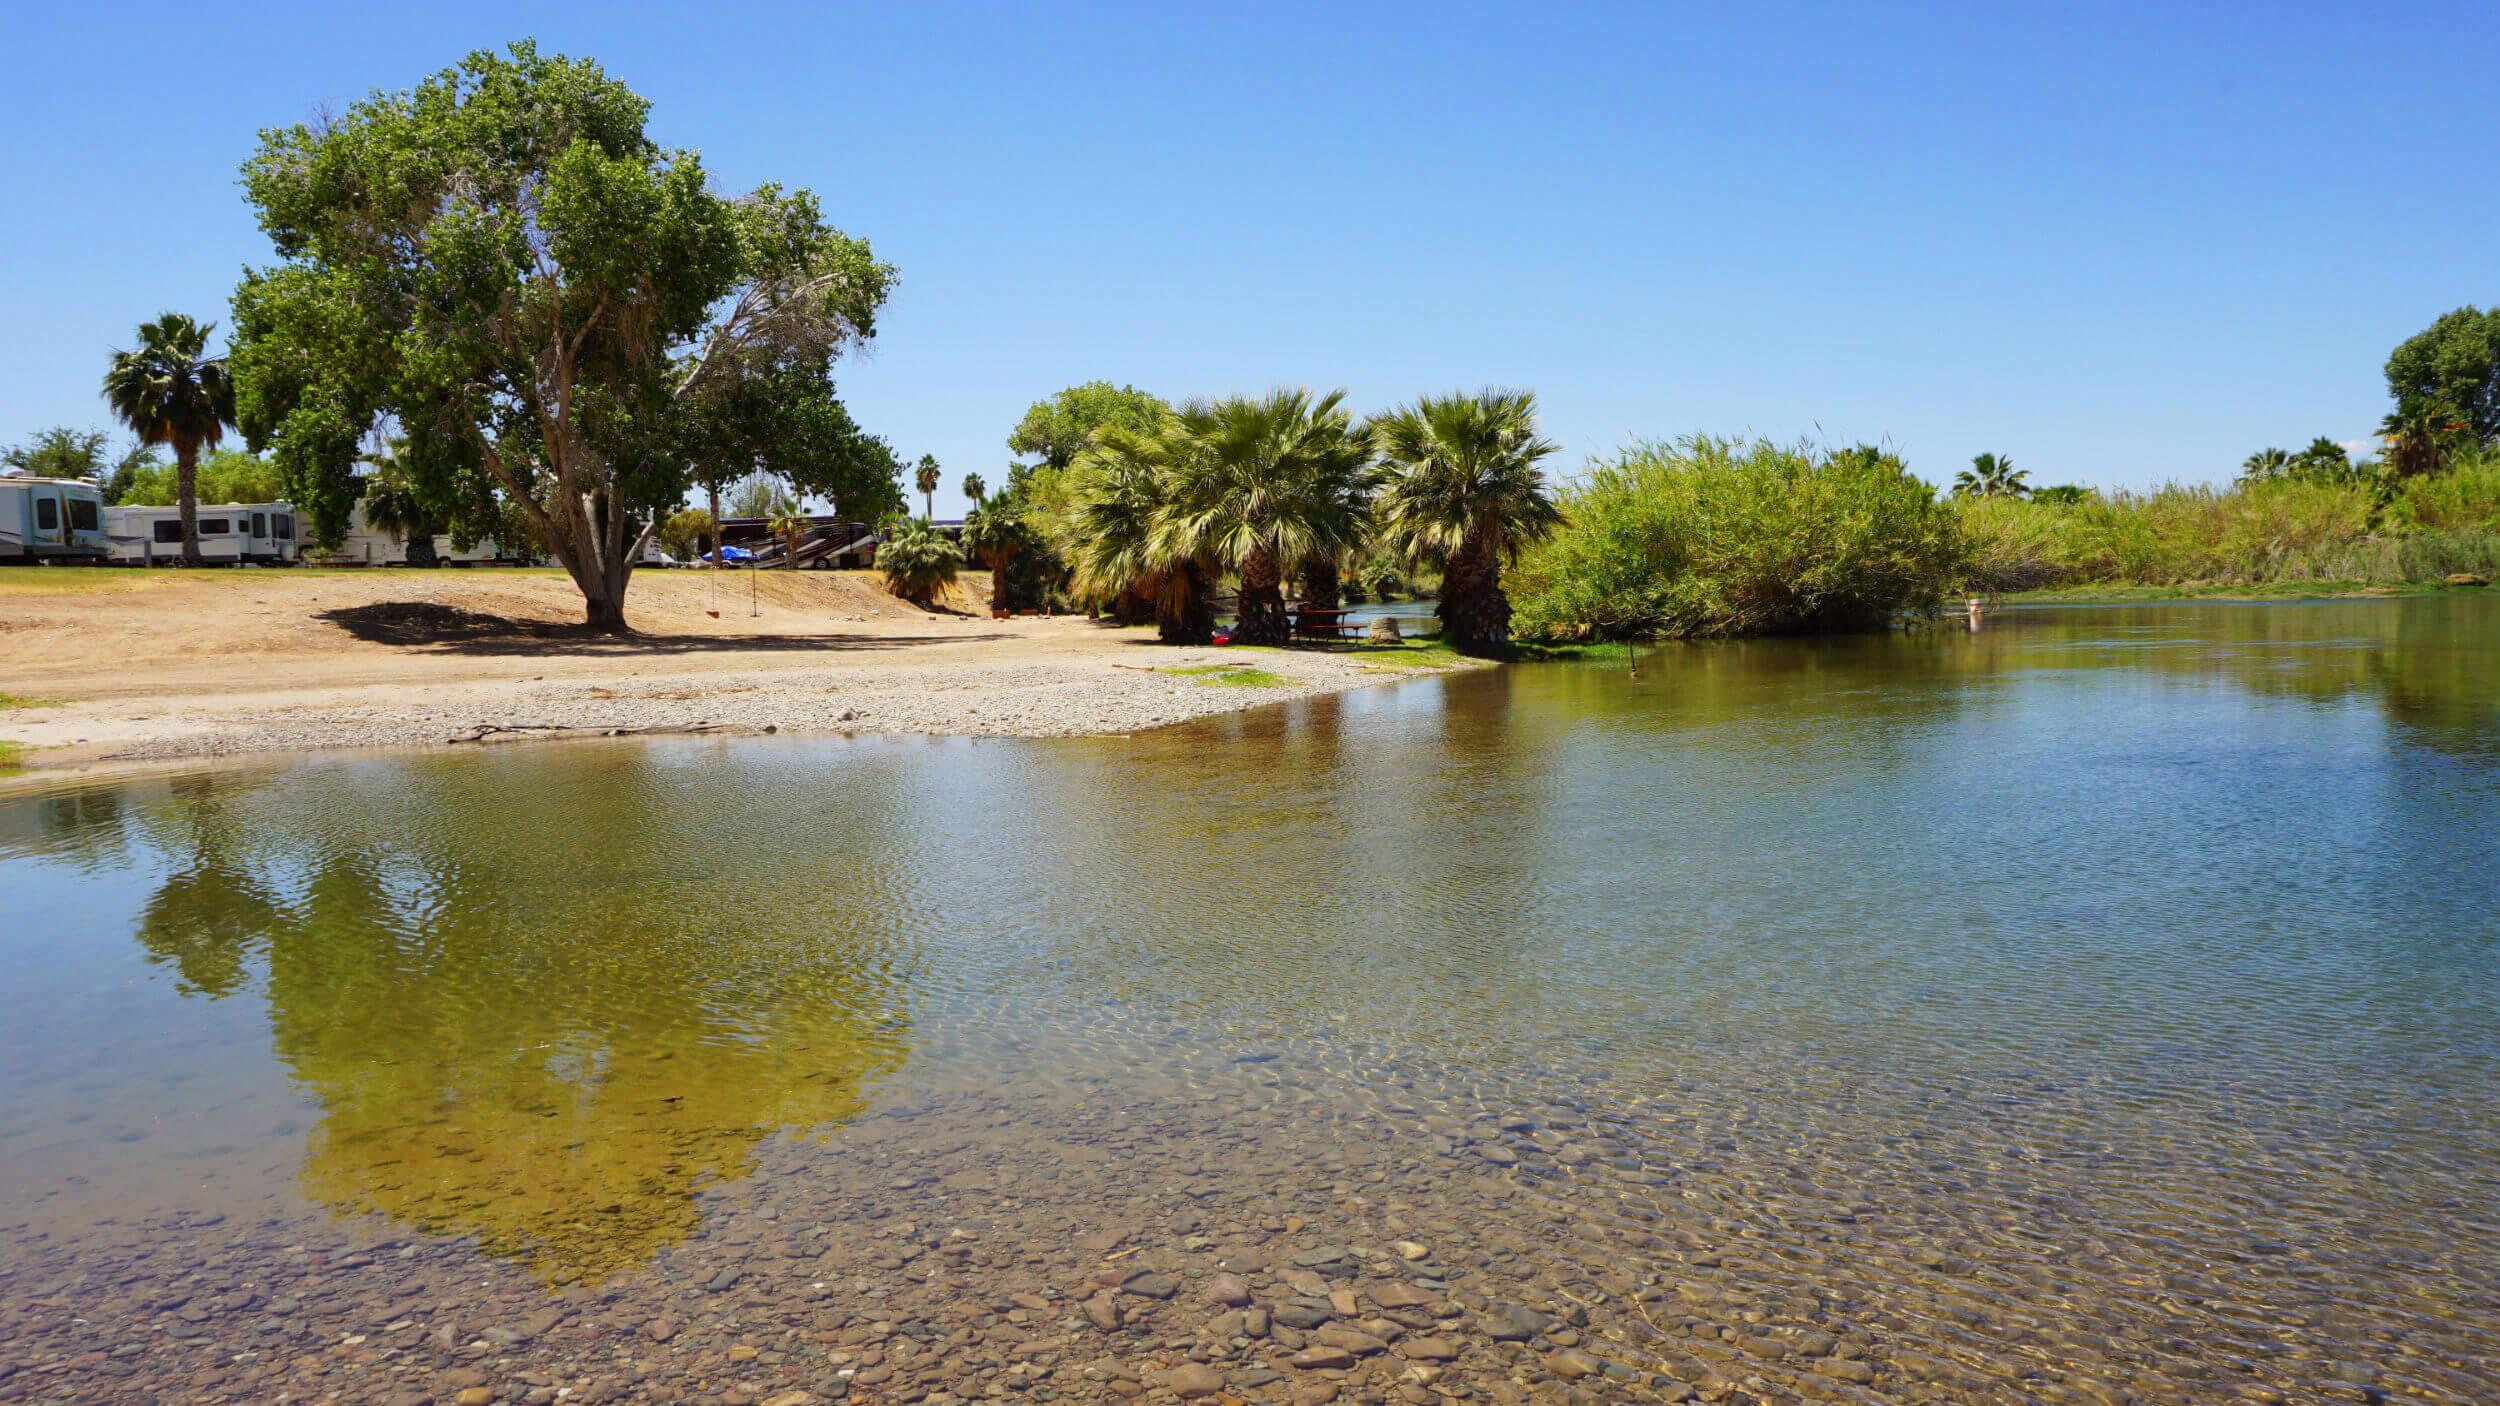 colorado-river-beach-arizona-oasis.jpg